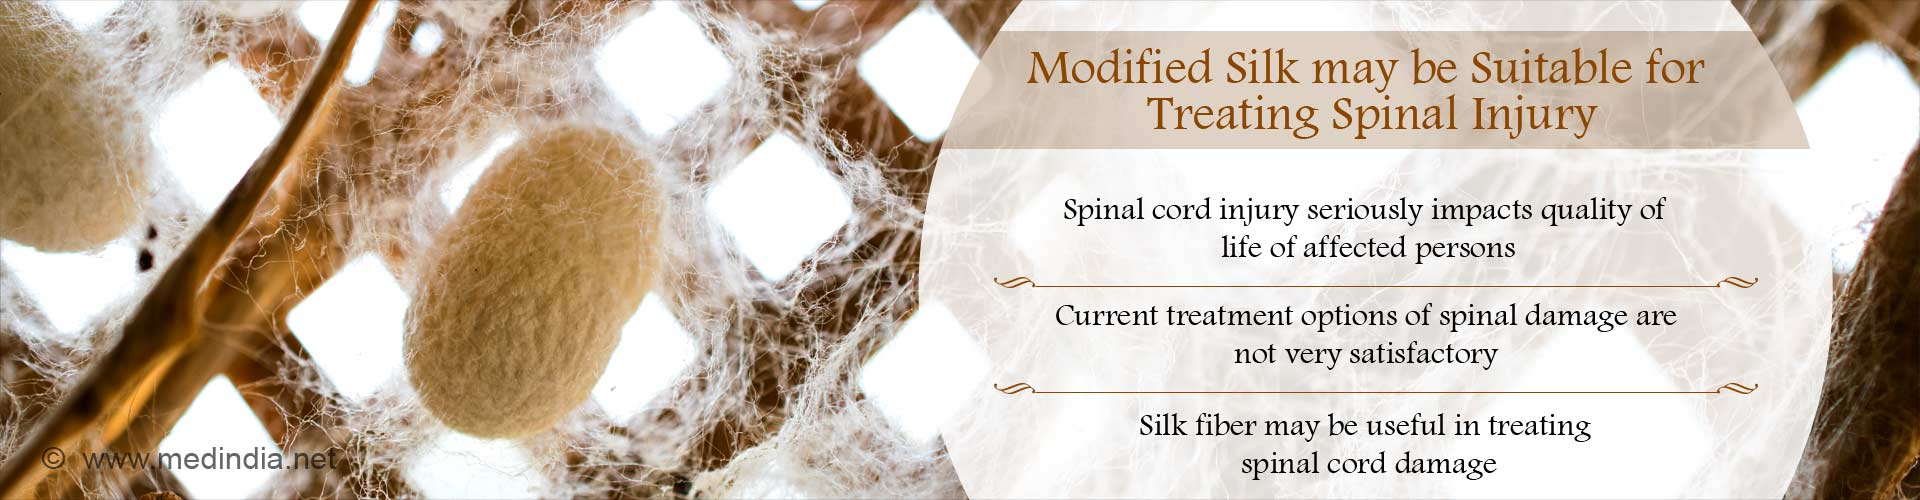 Spinal Cord Damage May Be Treated Using Silk Filament